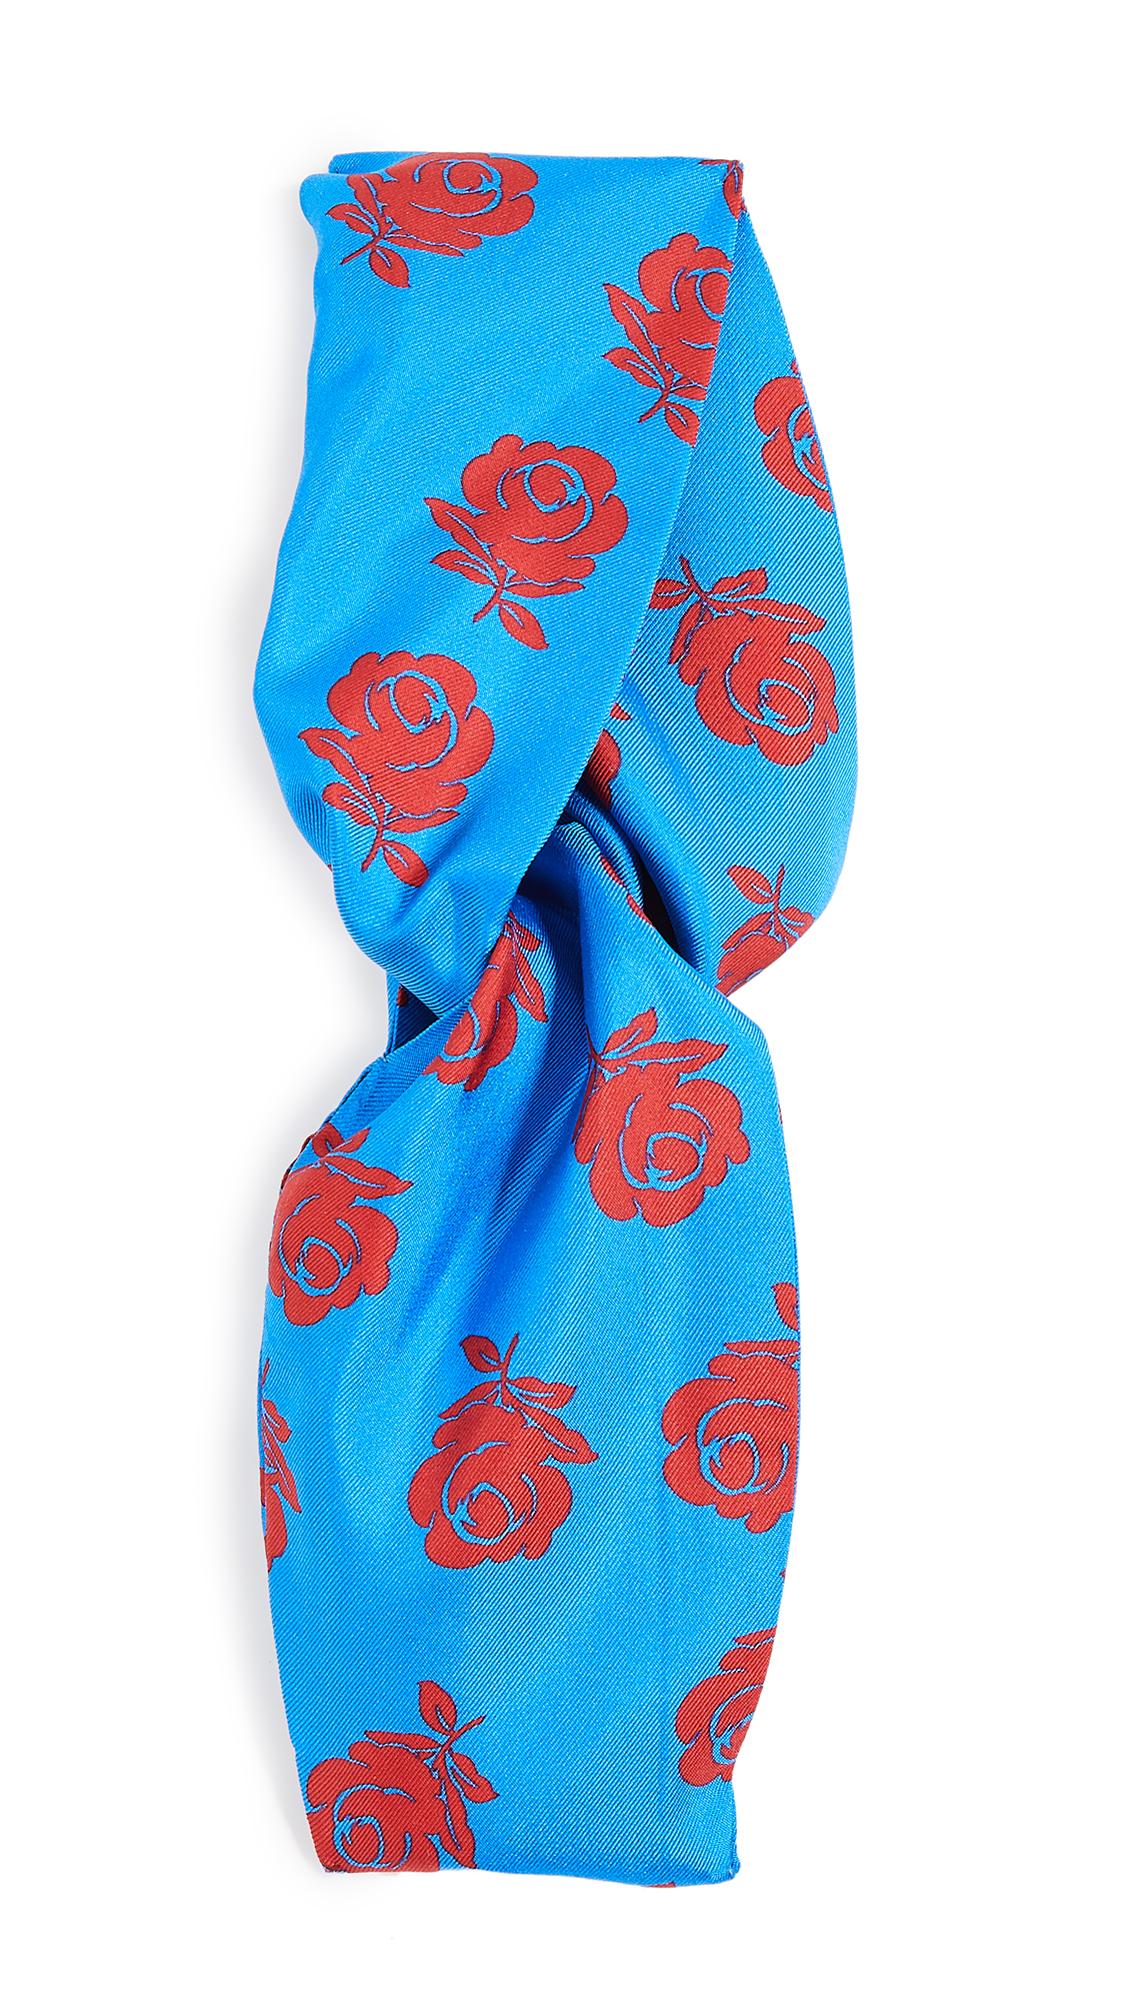 KENZO Roses Turban Headband - Cobalt